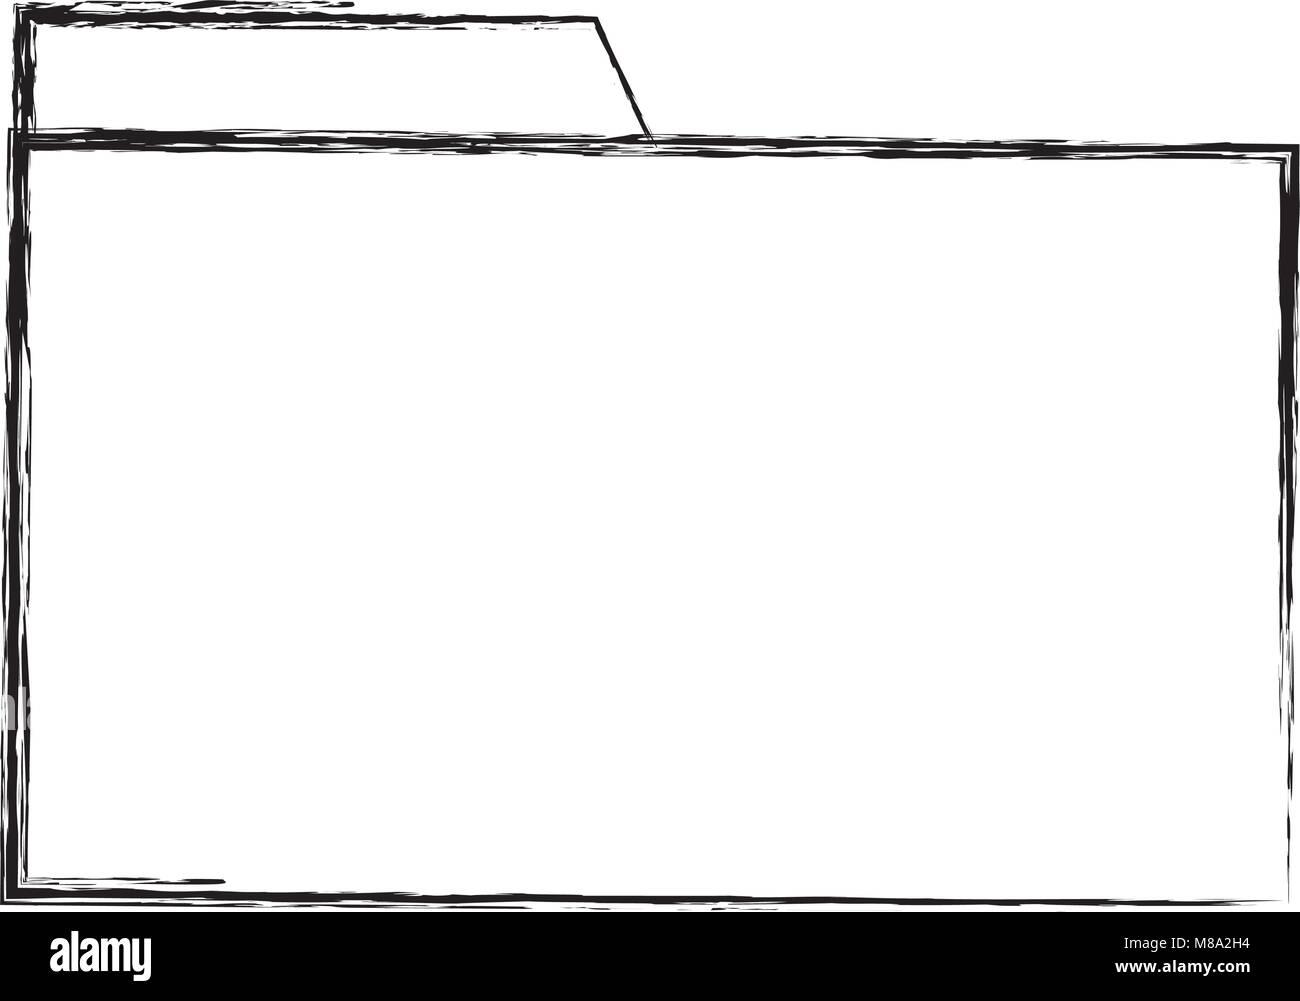 grunge file folder archive to organize information - Stock Image